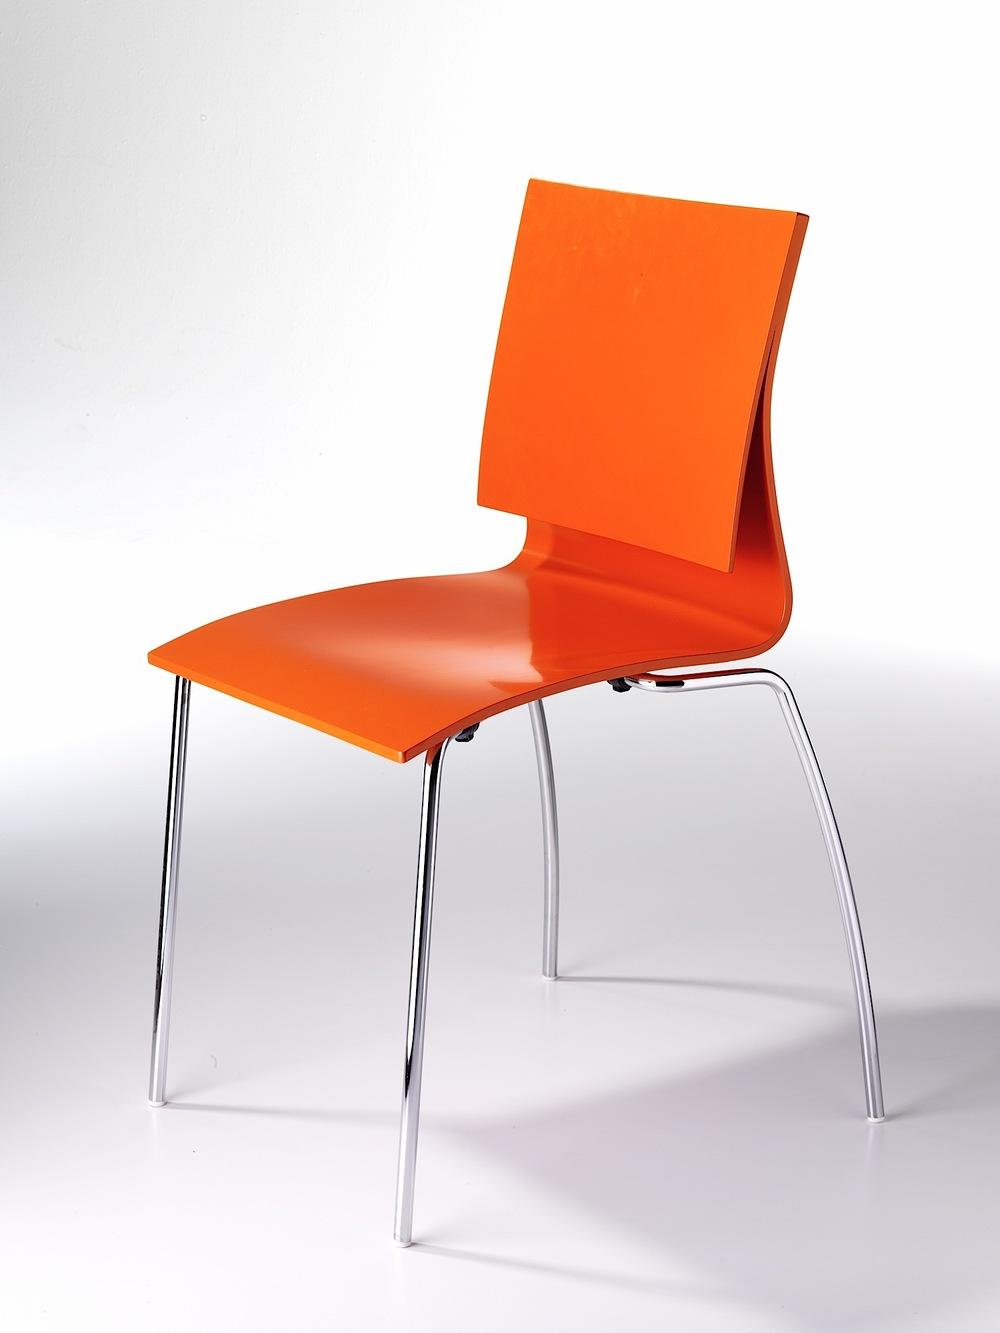 Stuhl_orange 002.jpg